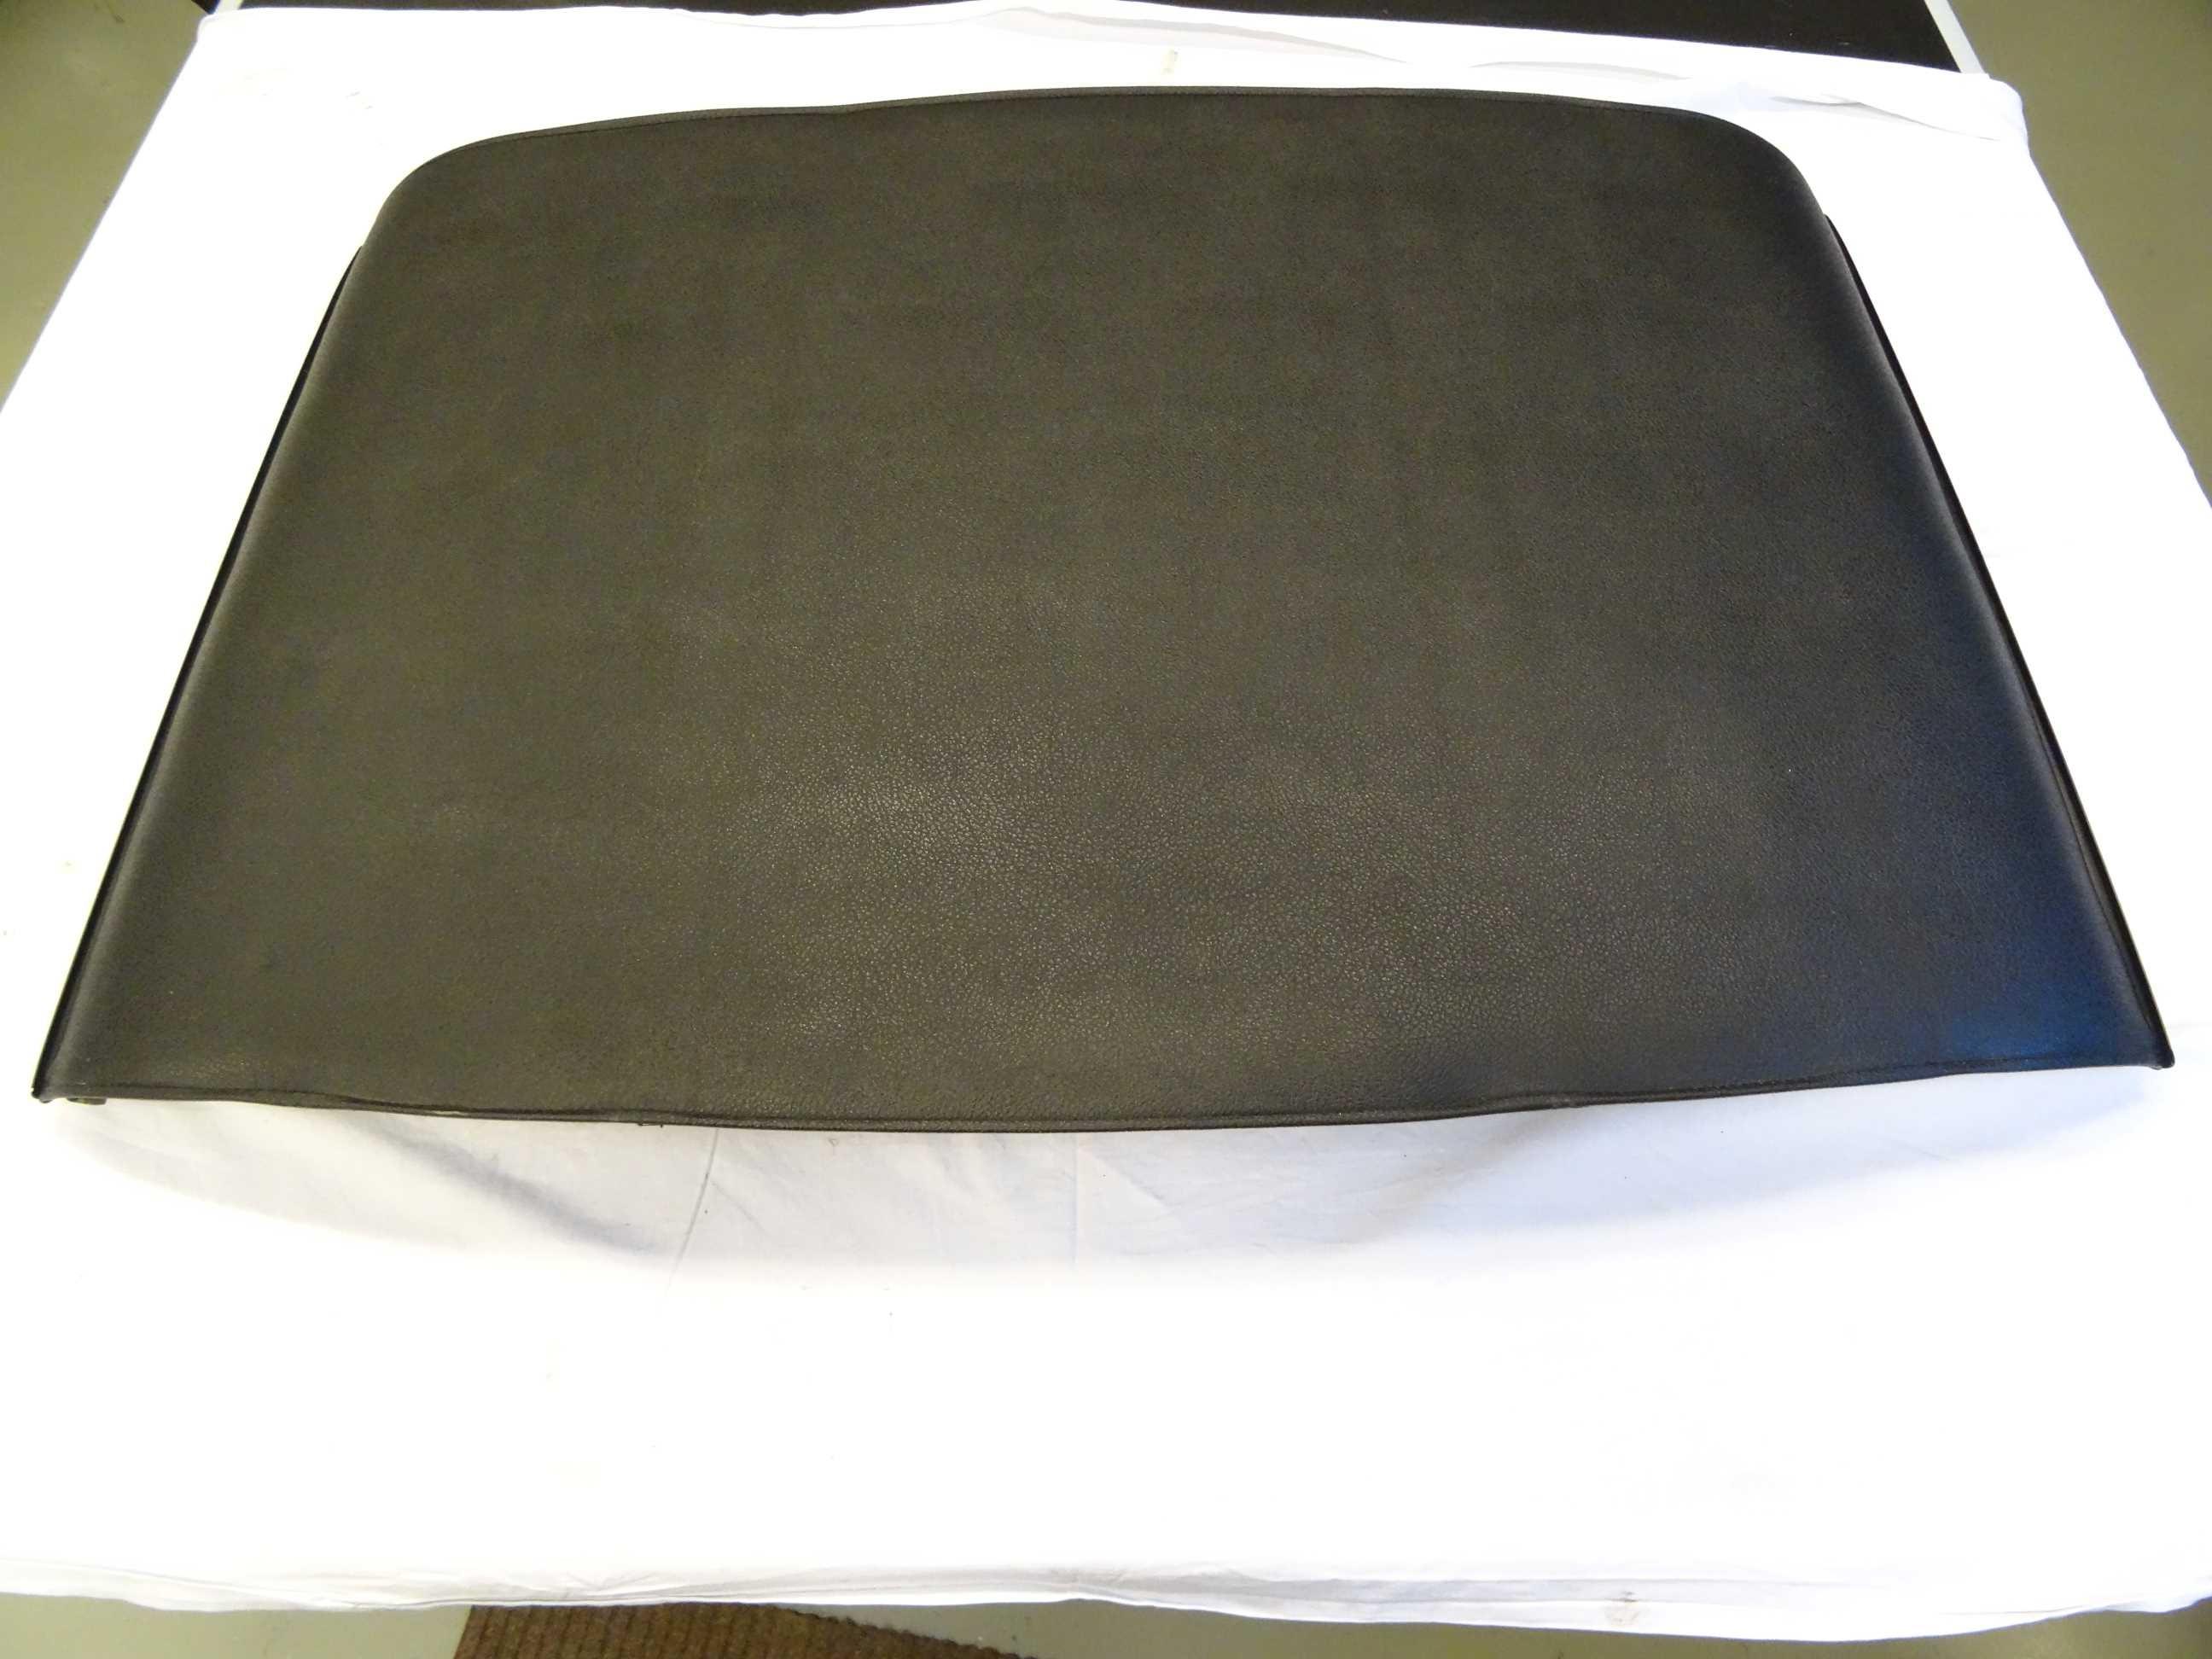 porsche 911 targadach f g modell targa roof ebay. Black Bedroom Furniture Sets. Home Design Ideas